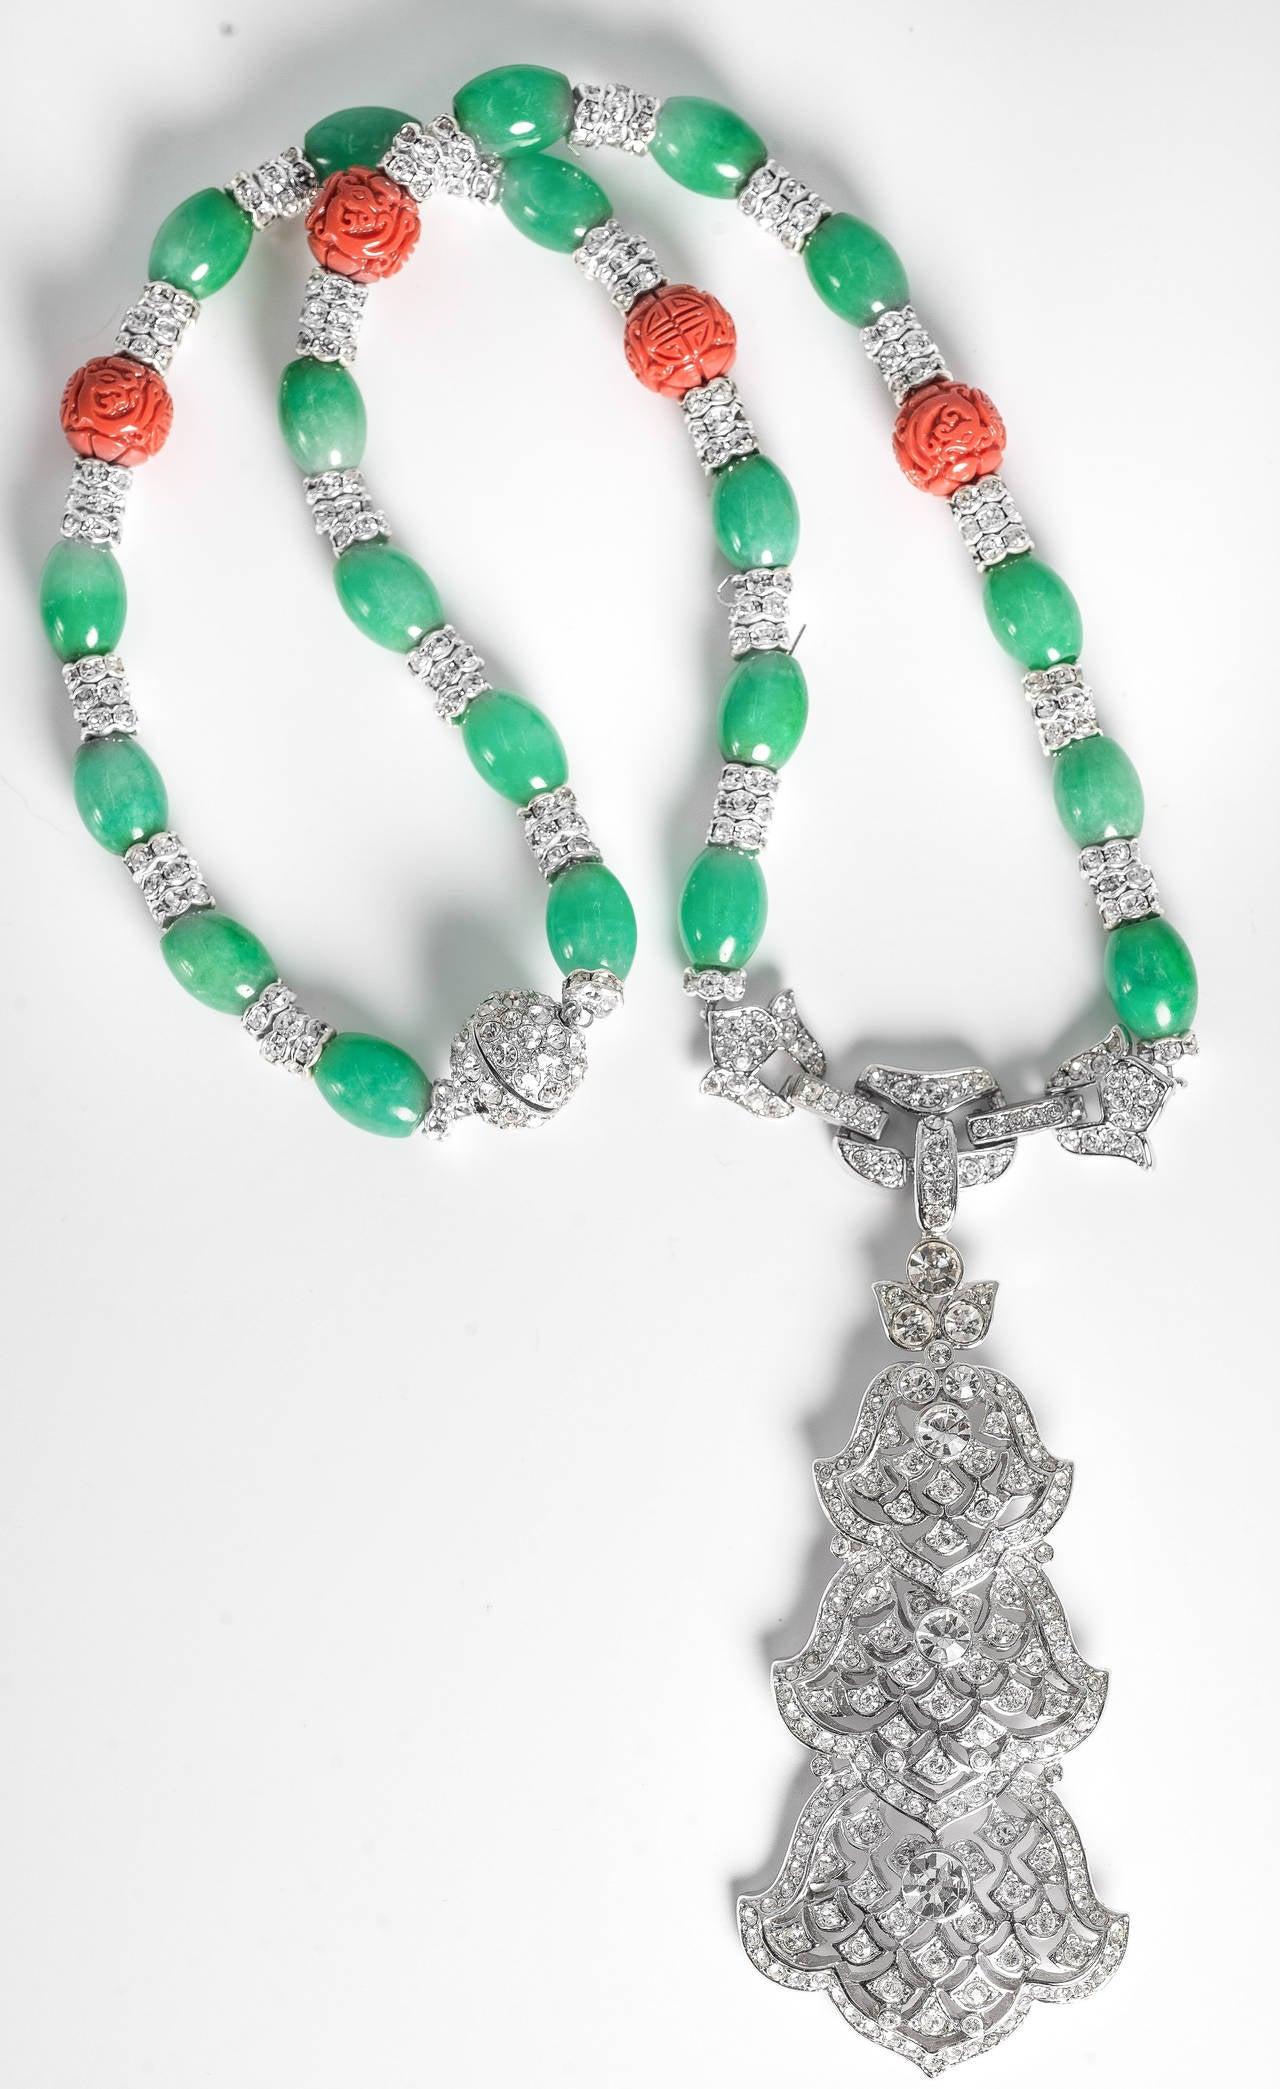 Amazing Art Deco Style Faux Diamond Jade Coral Long Necklace 3